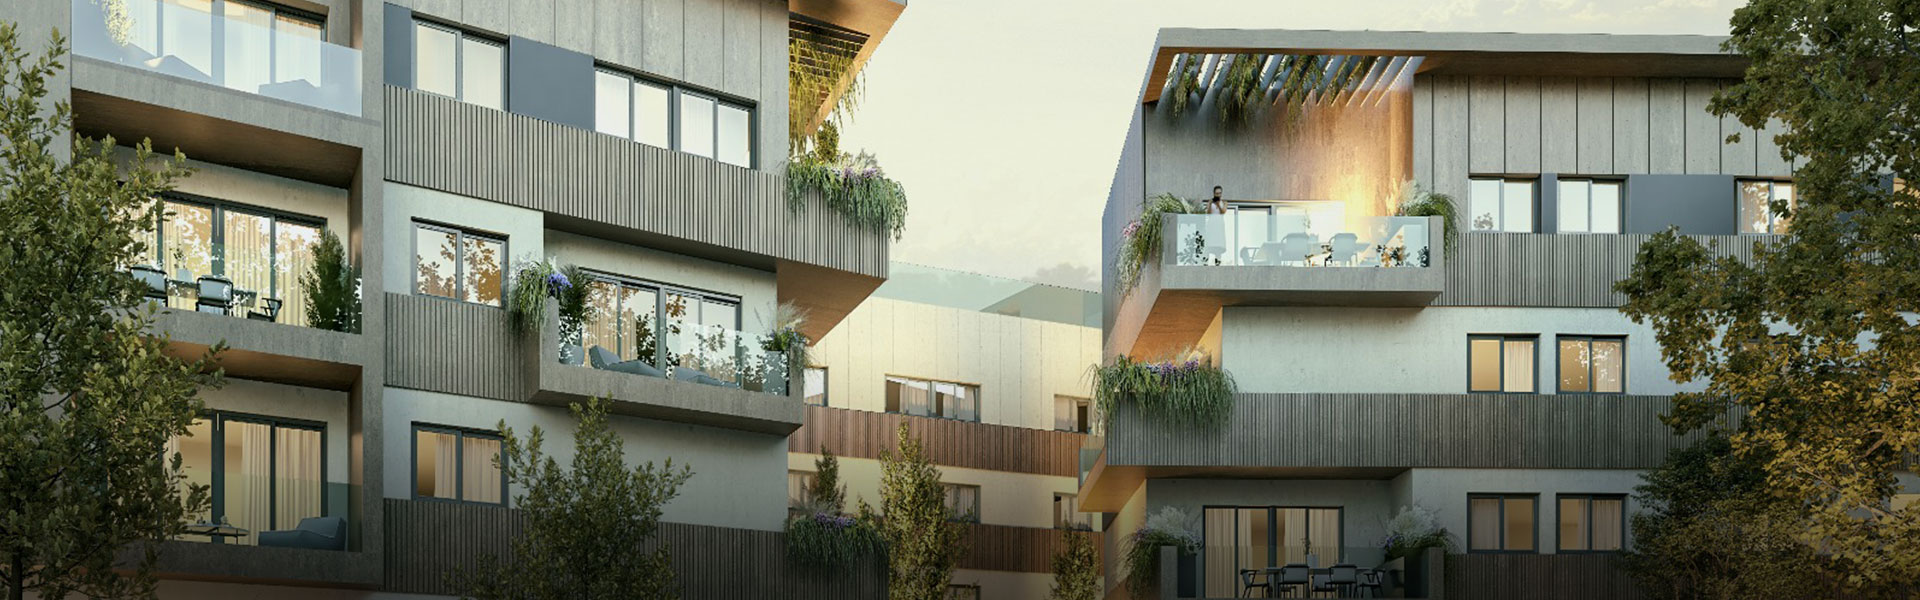 Promoción e obra nueva en Sevilla: Residencial Fábrica de Vidrios